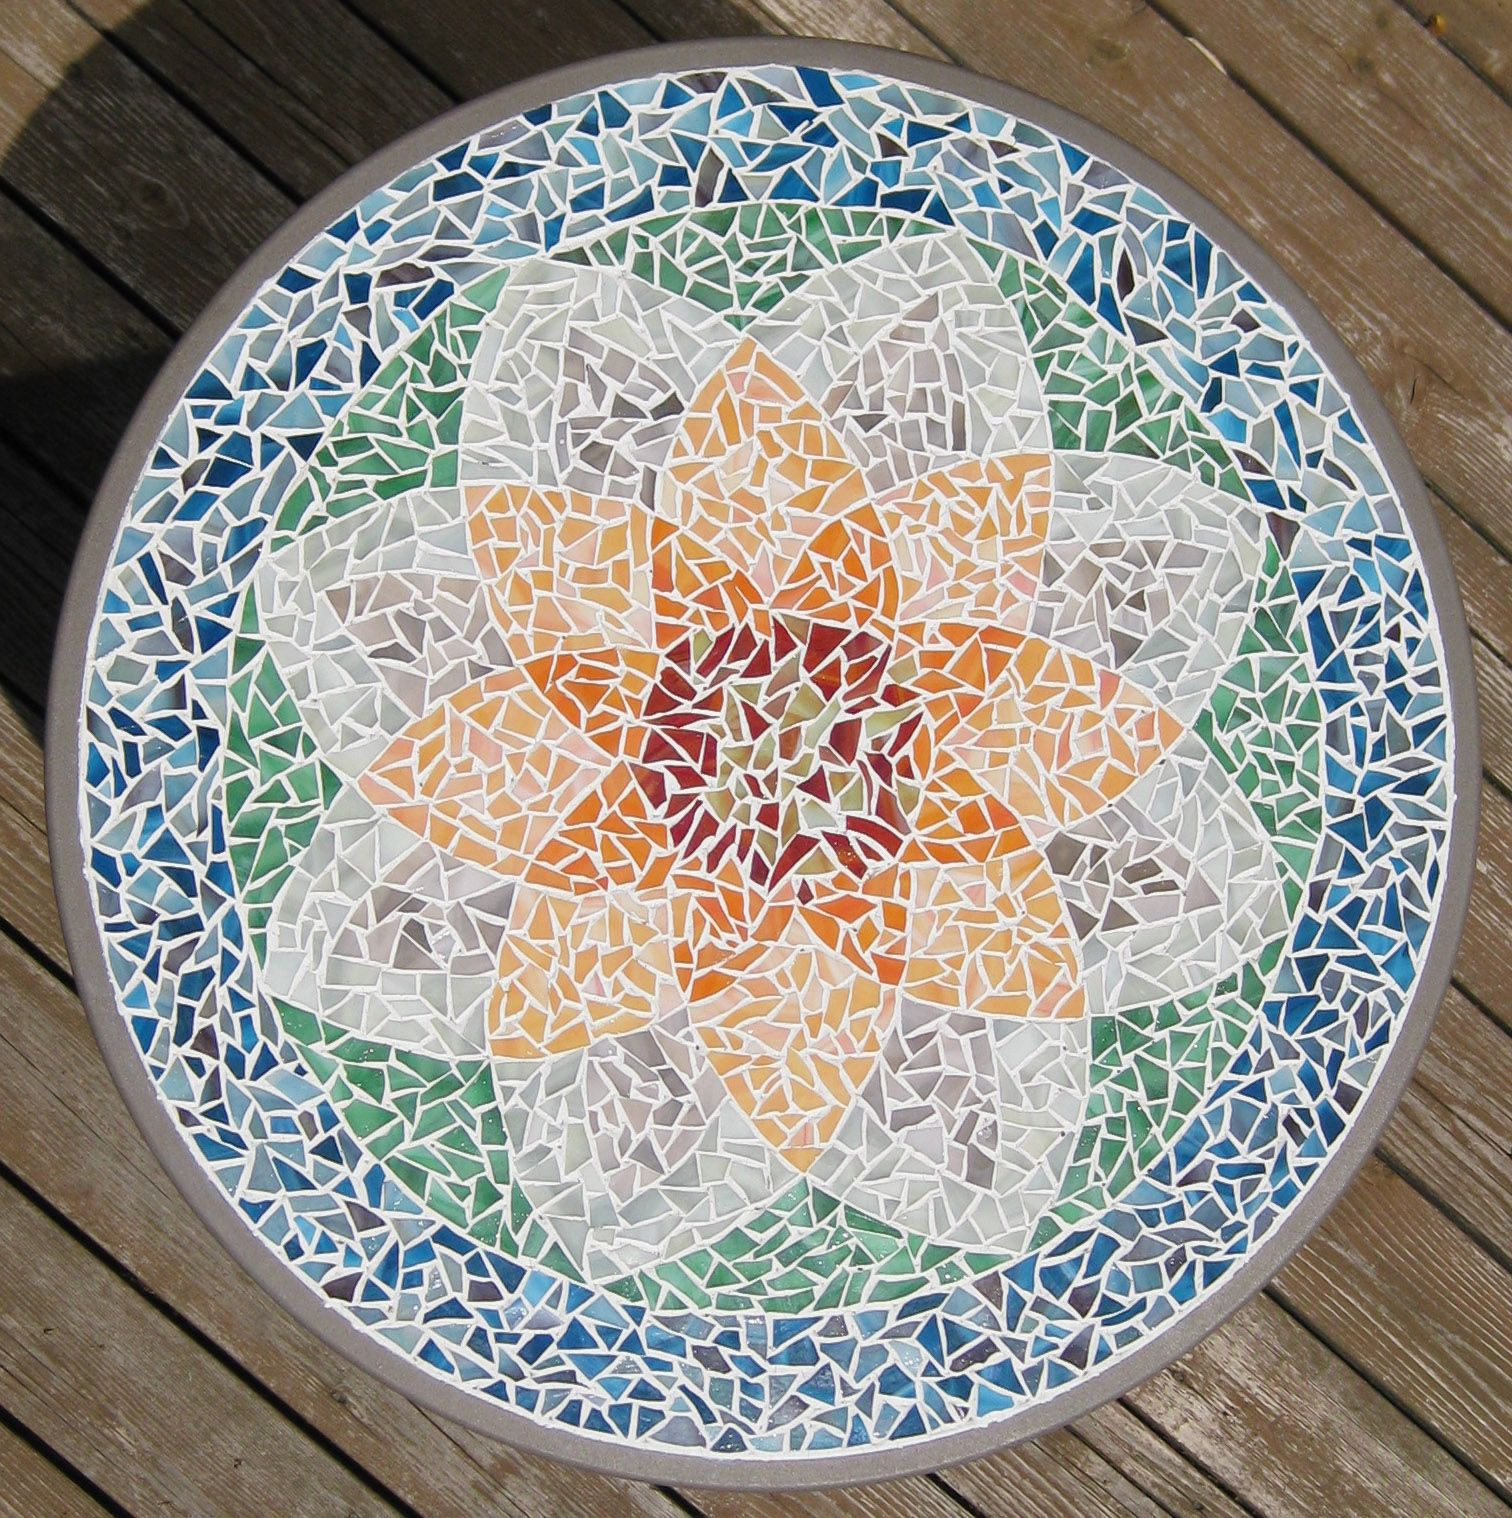 Table Mosaic Patterns: Orange Lotus Mosaic Table - Art Glass I Want